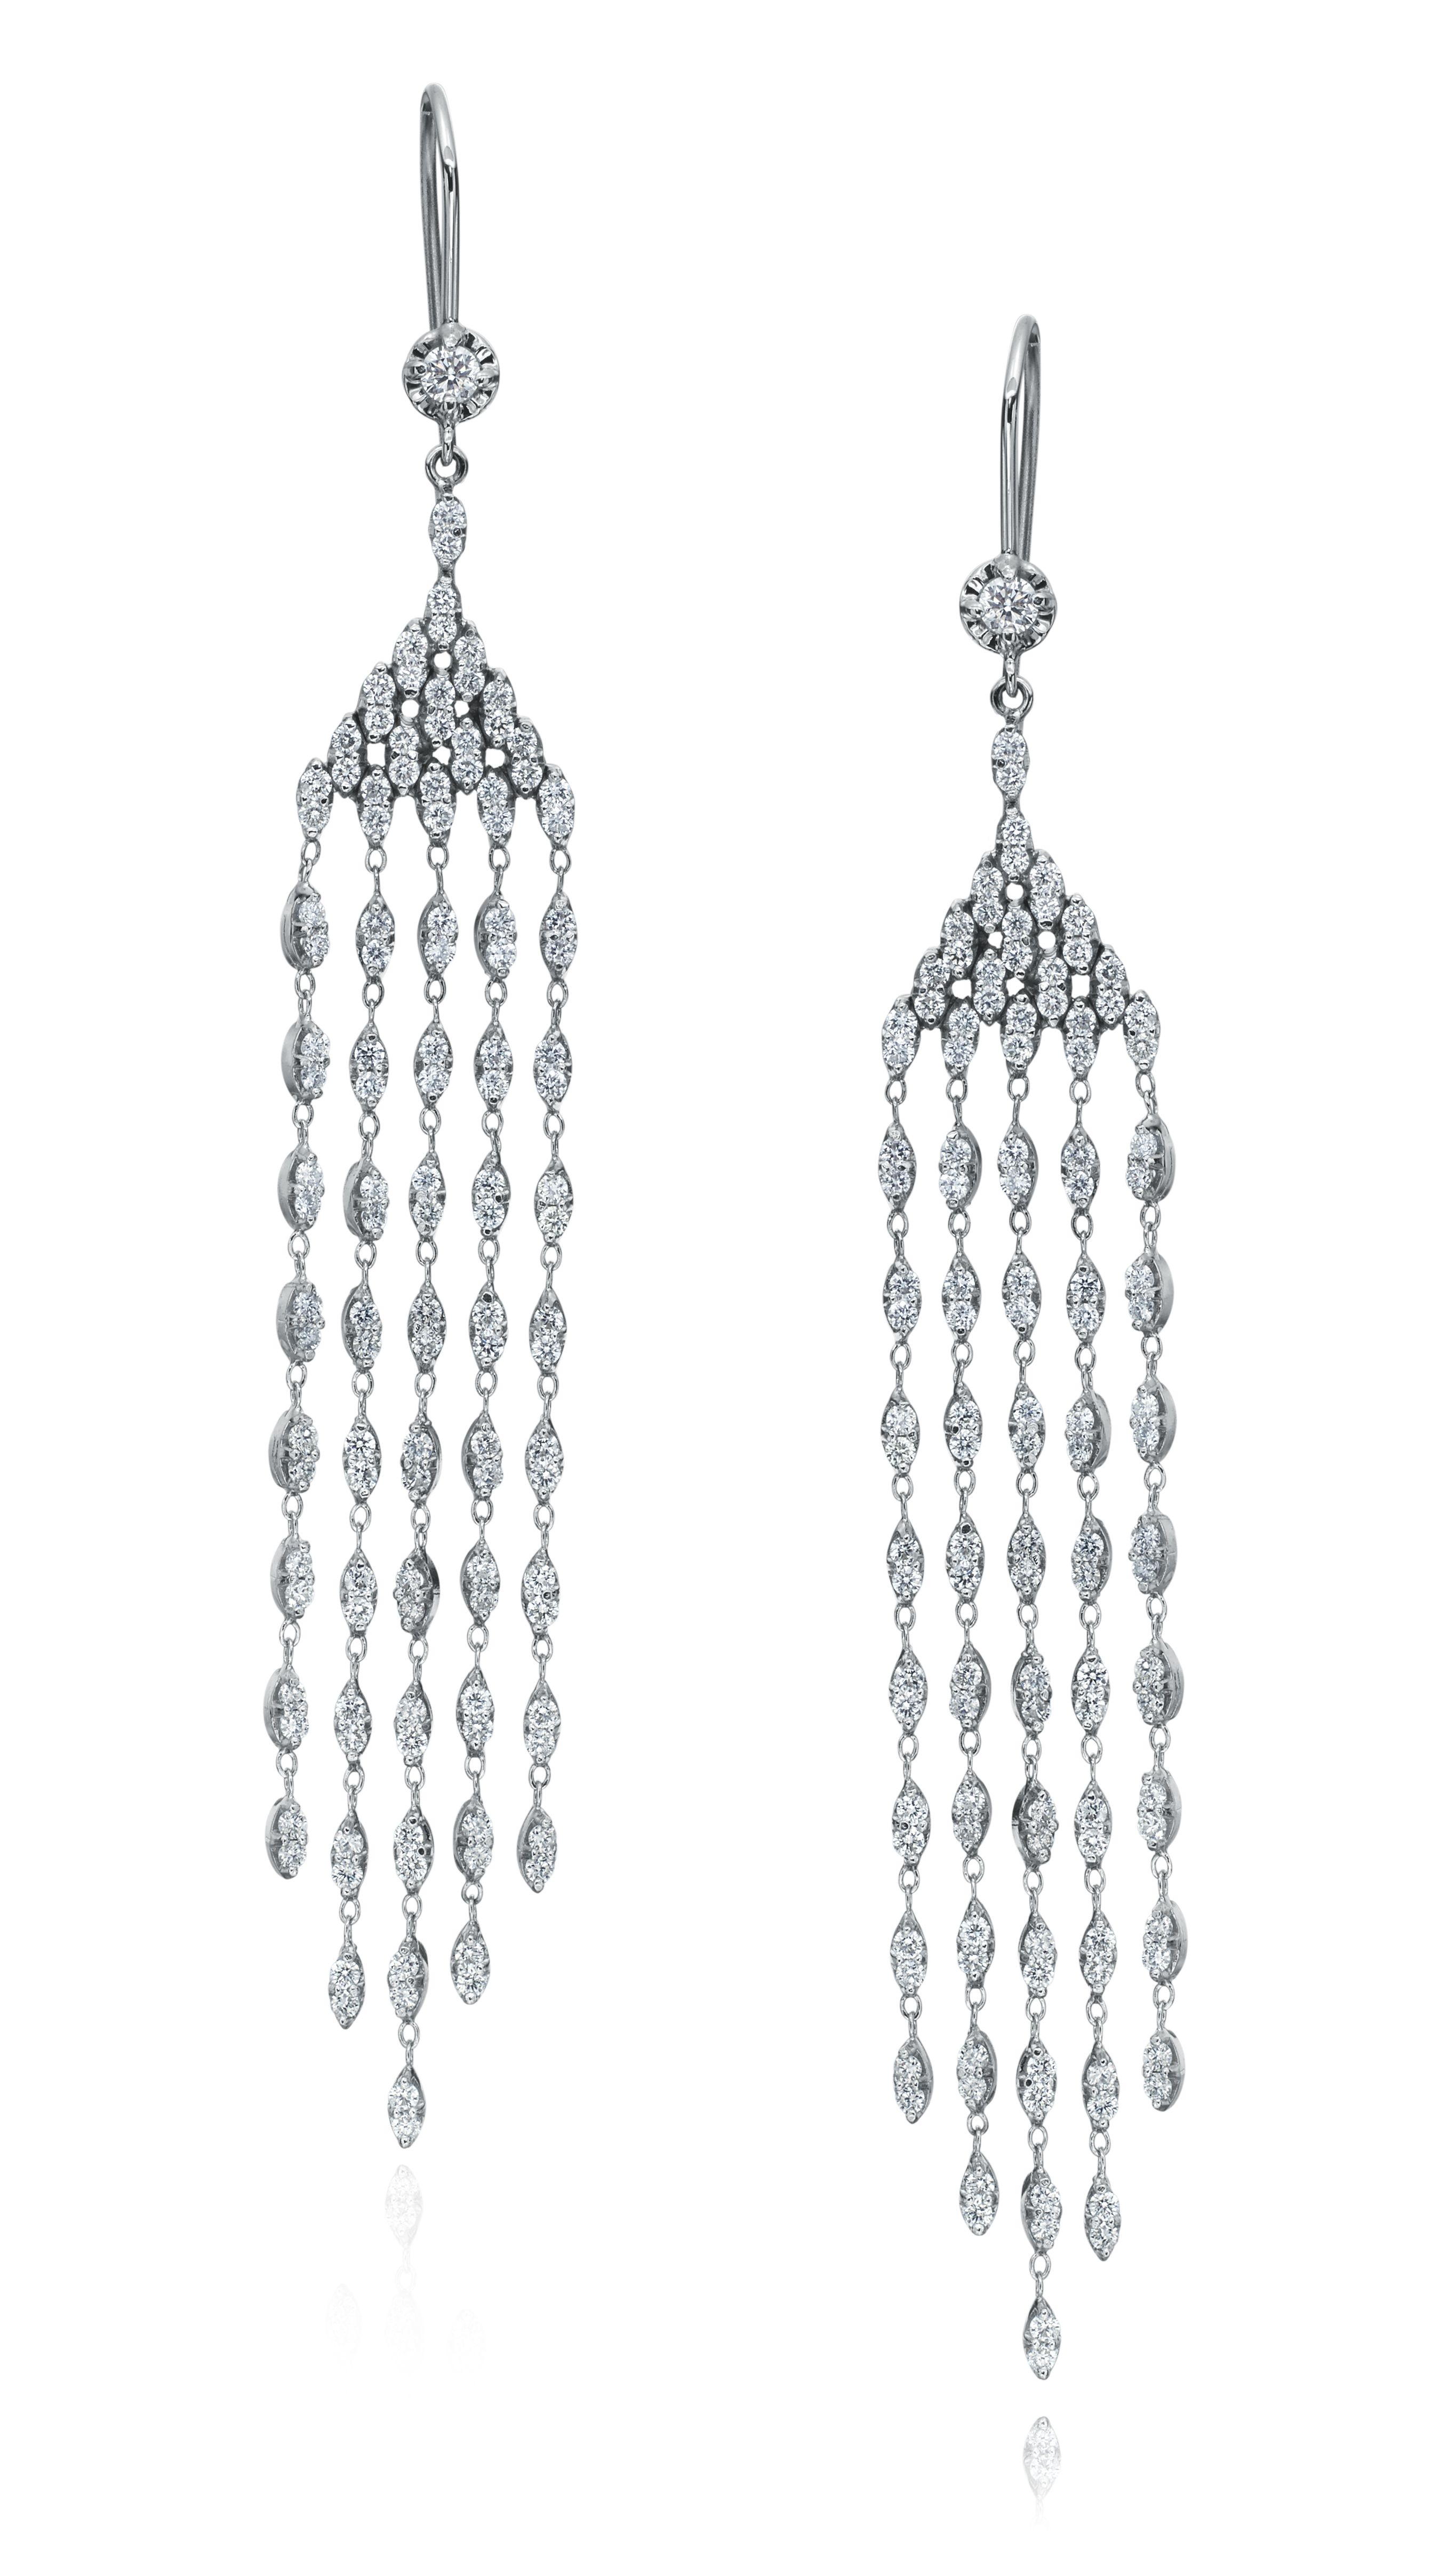 Yanina co 18k white gold and diamond chandelier earrings with 18k white gold and diamond chandelier earrings with diamond strands aloadofball Images